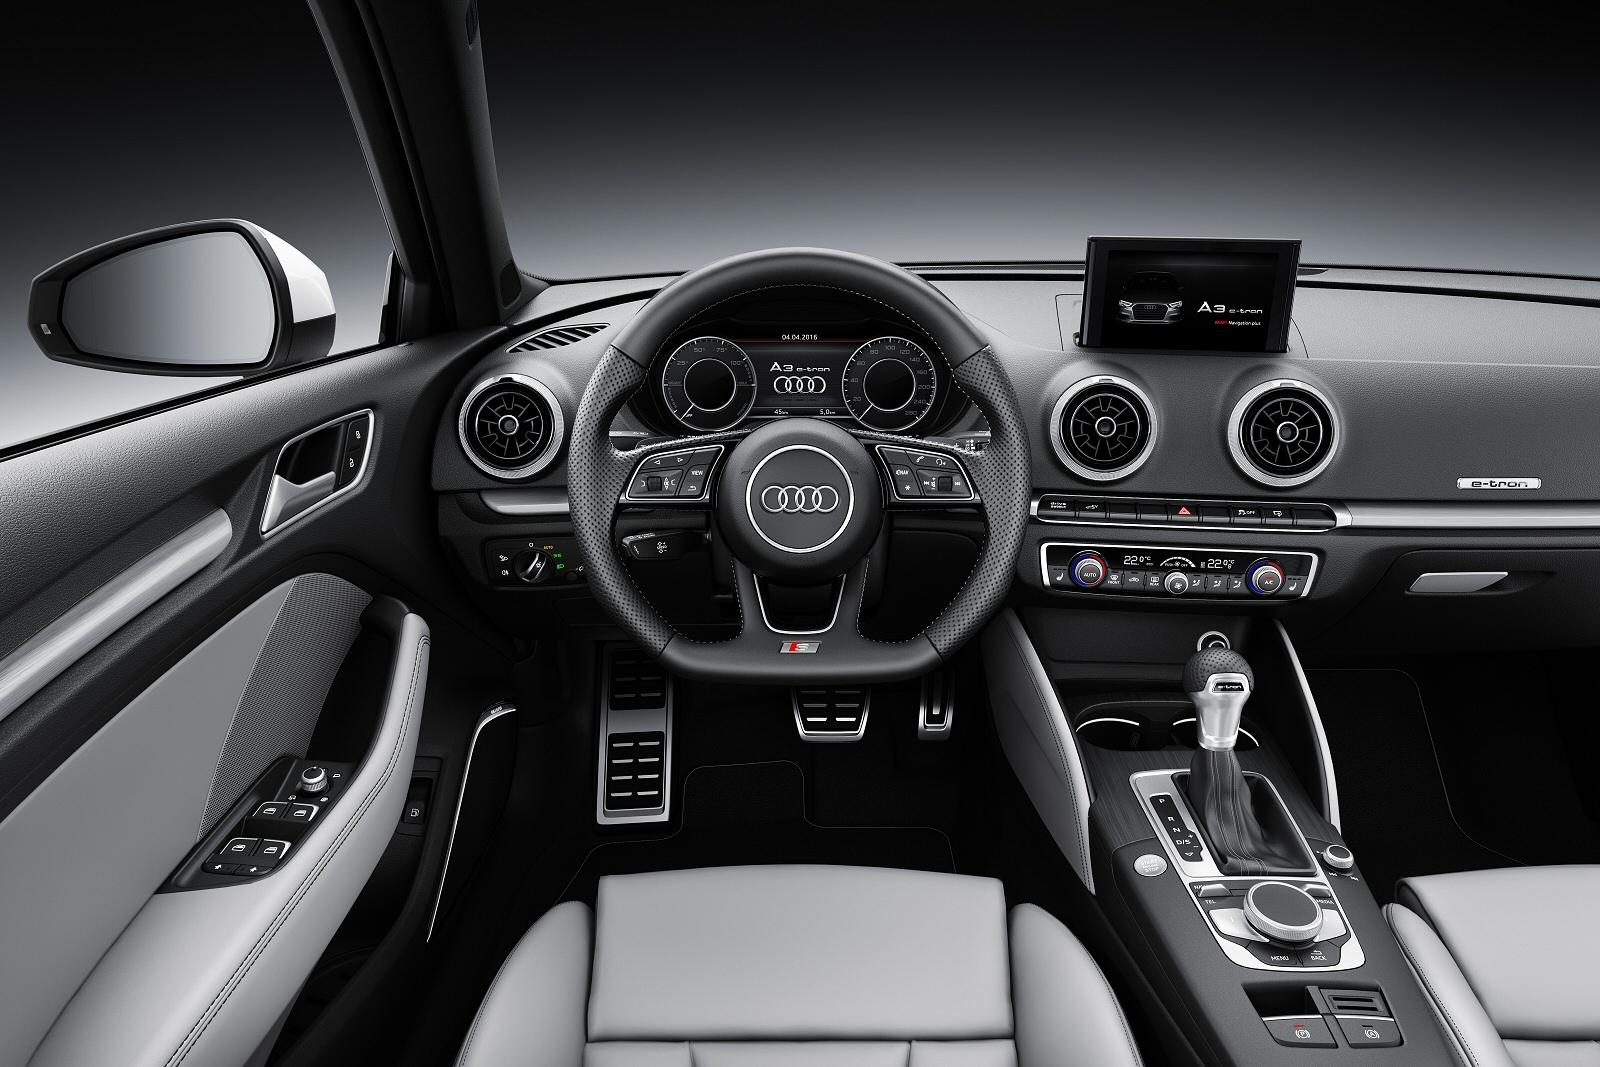 specs photos hatchback driver price resize audi reviews center and original premium crop plus car